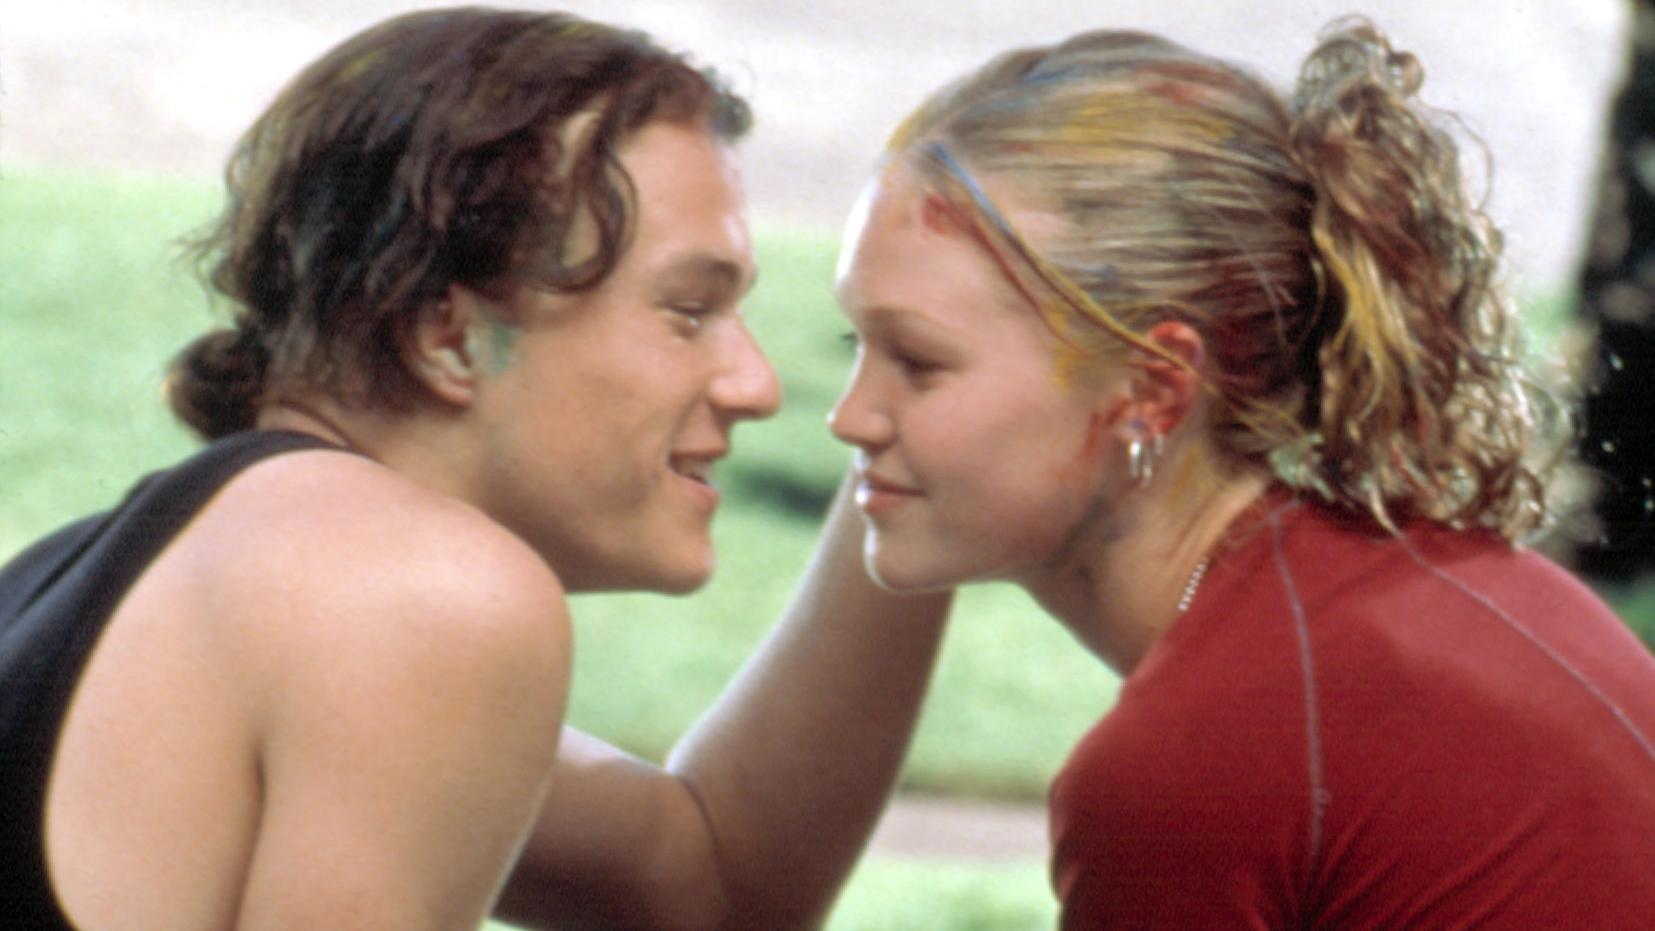 Heath Ledger and Julia Stiles